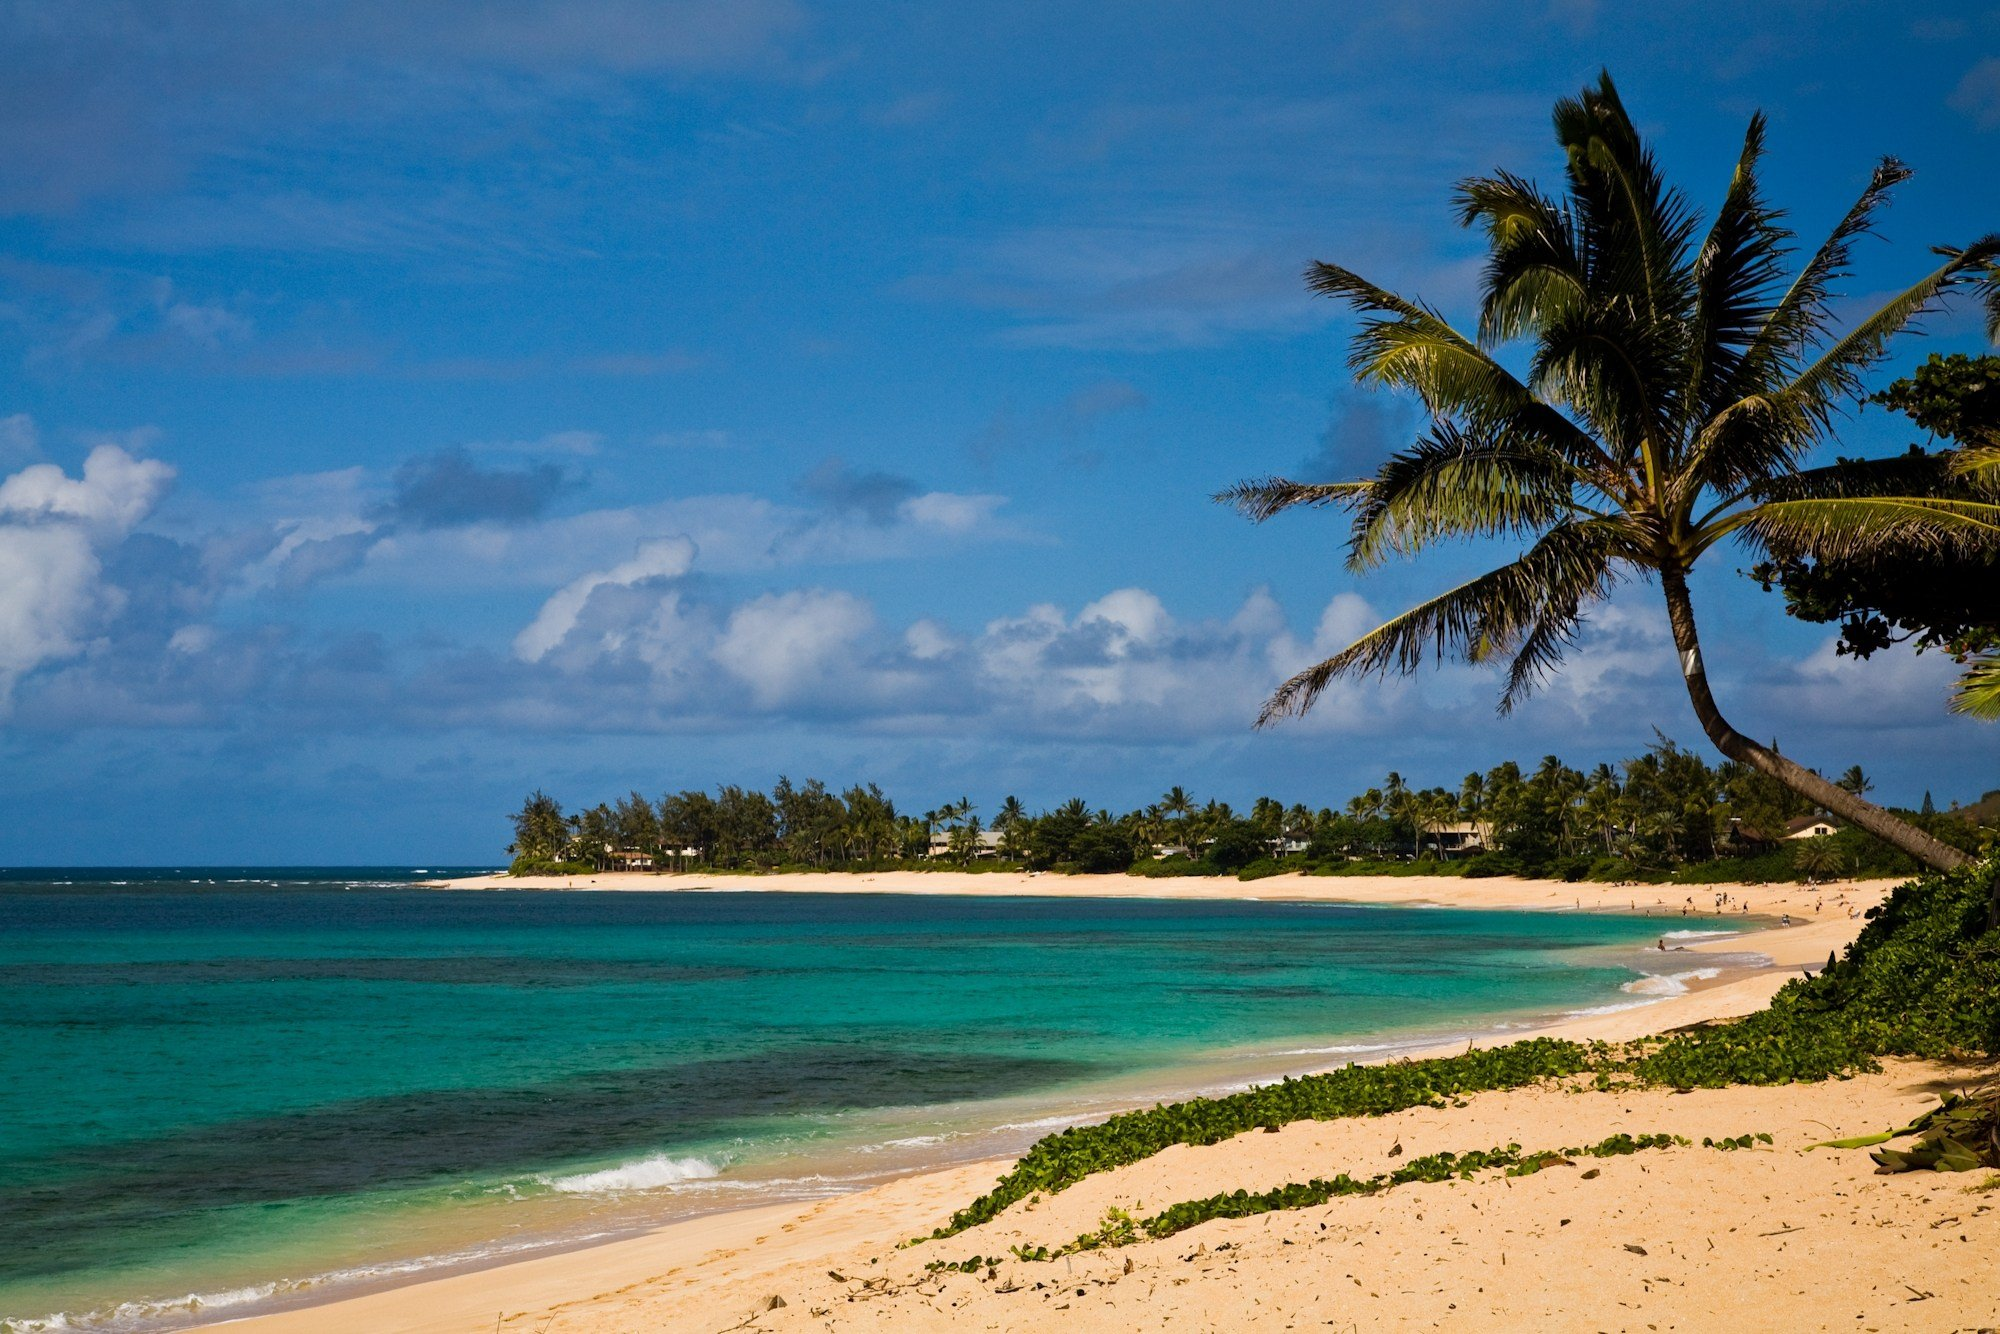 A beach in Hawaii. photo courtesy of CNN,